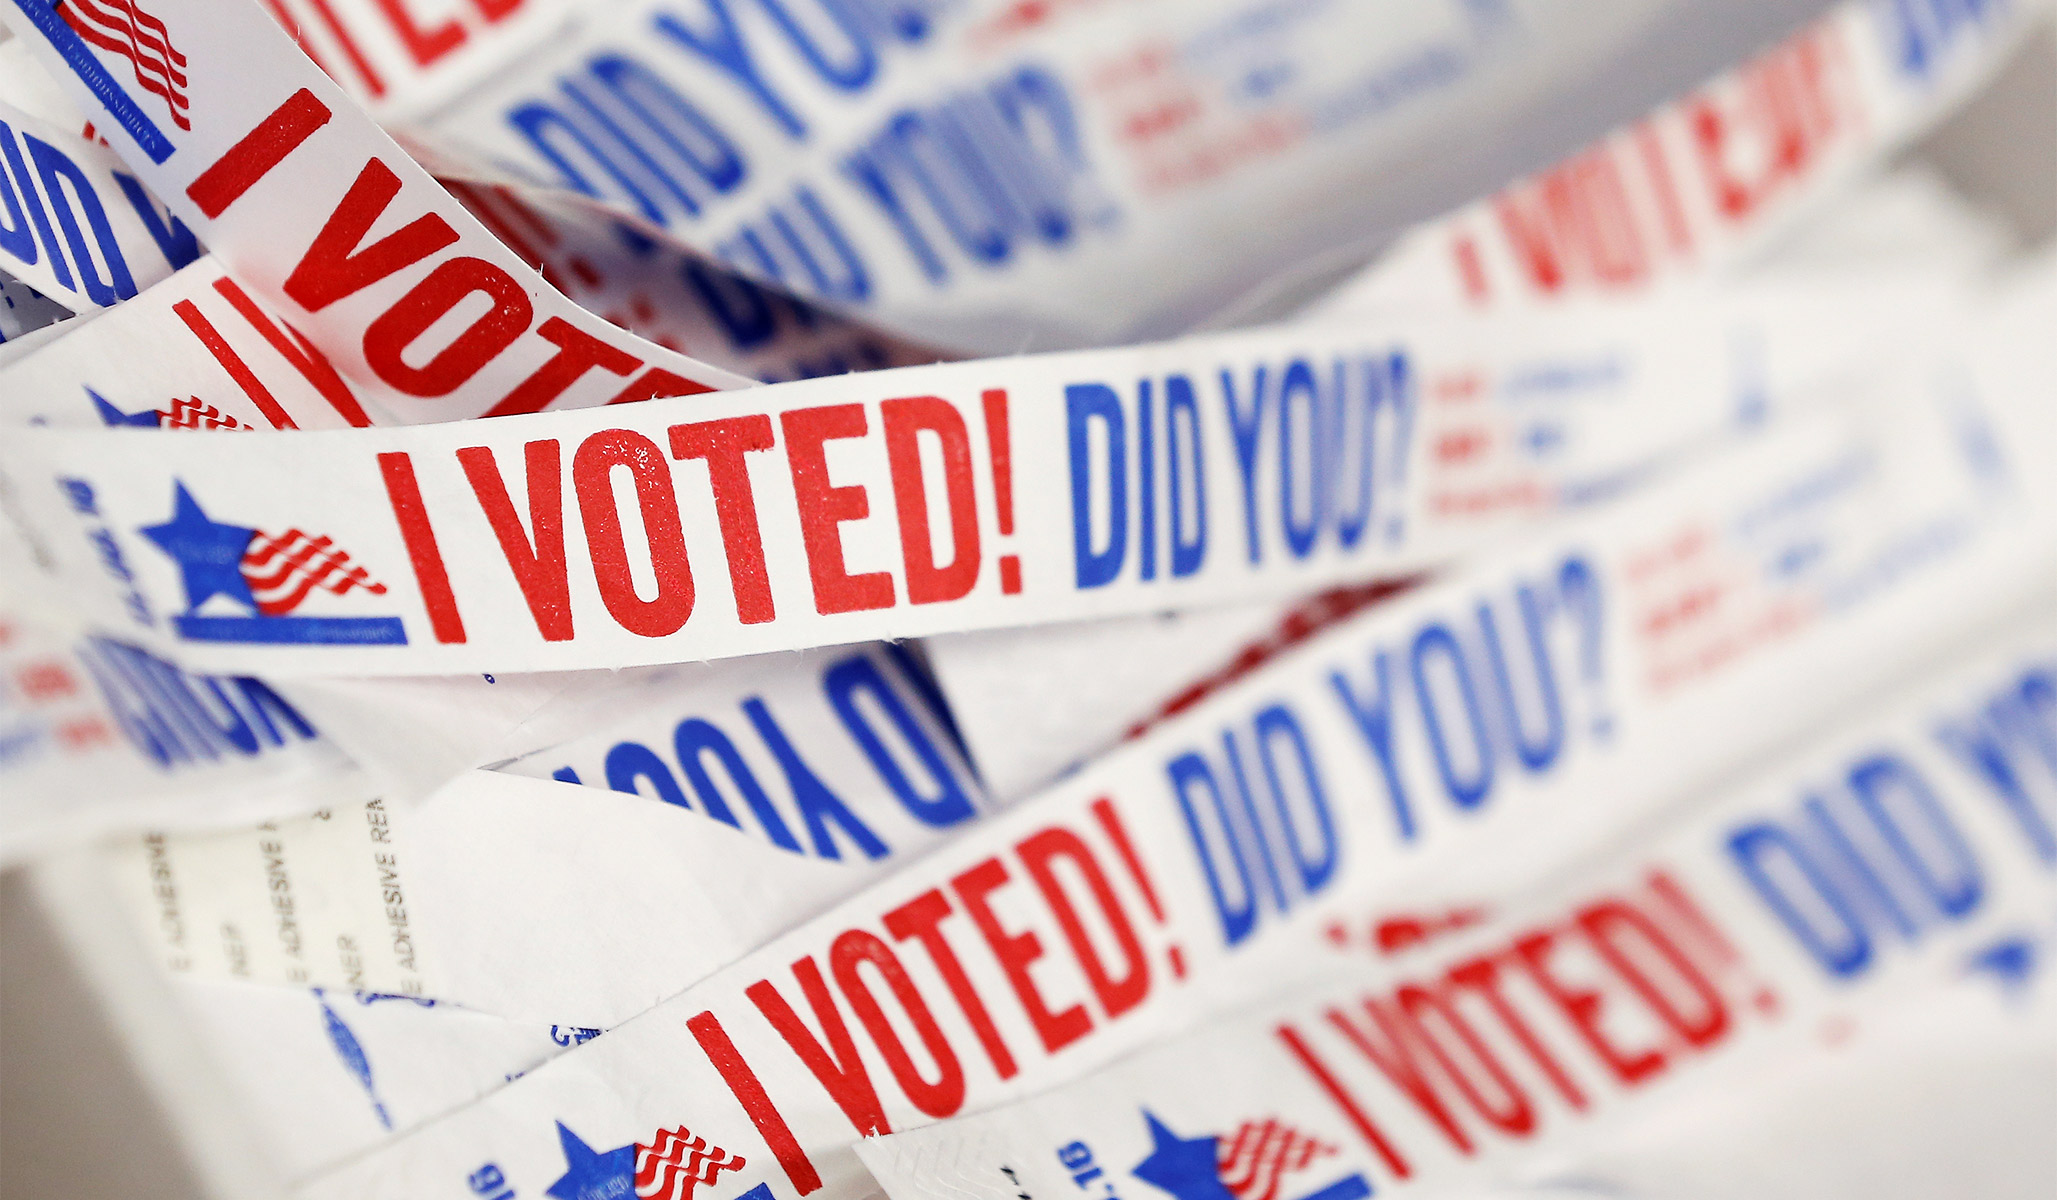 Hispanics Become Largest Voting-Eligible Minority Group